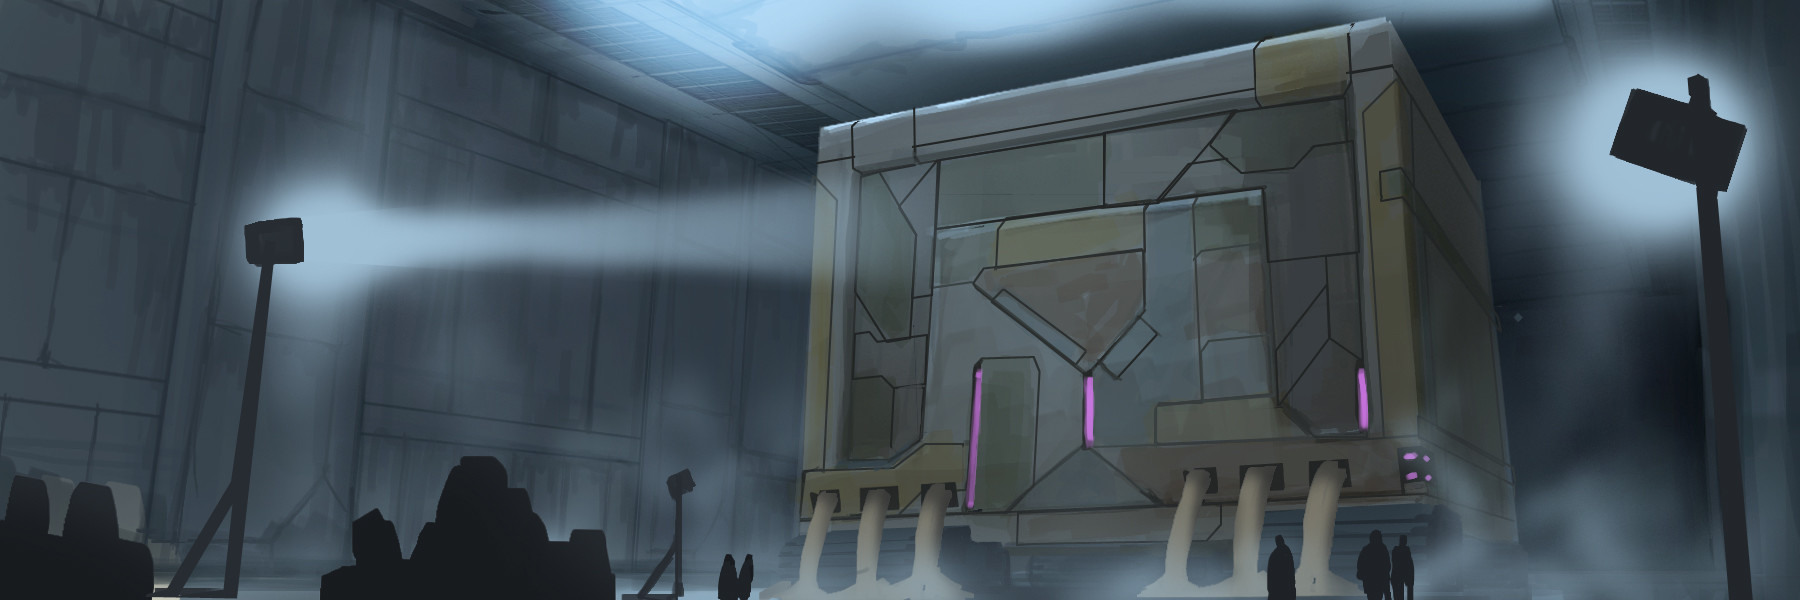 Oscar Linder - Stellaris More Events Mod Artwork